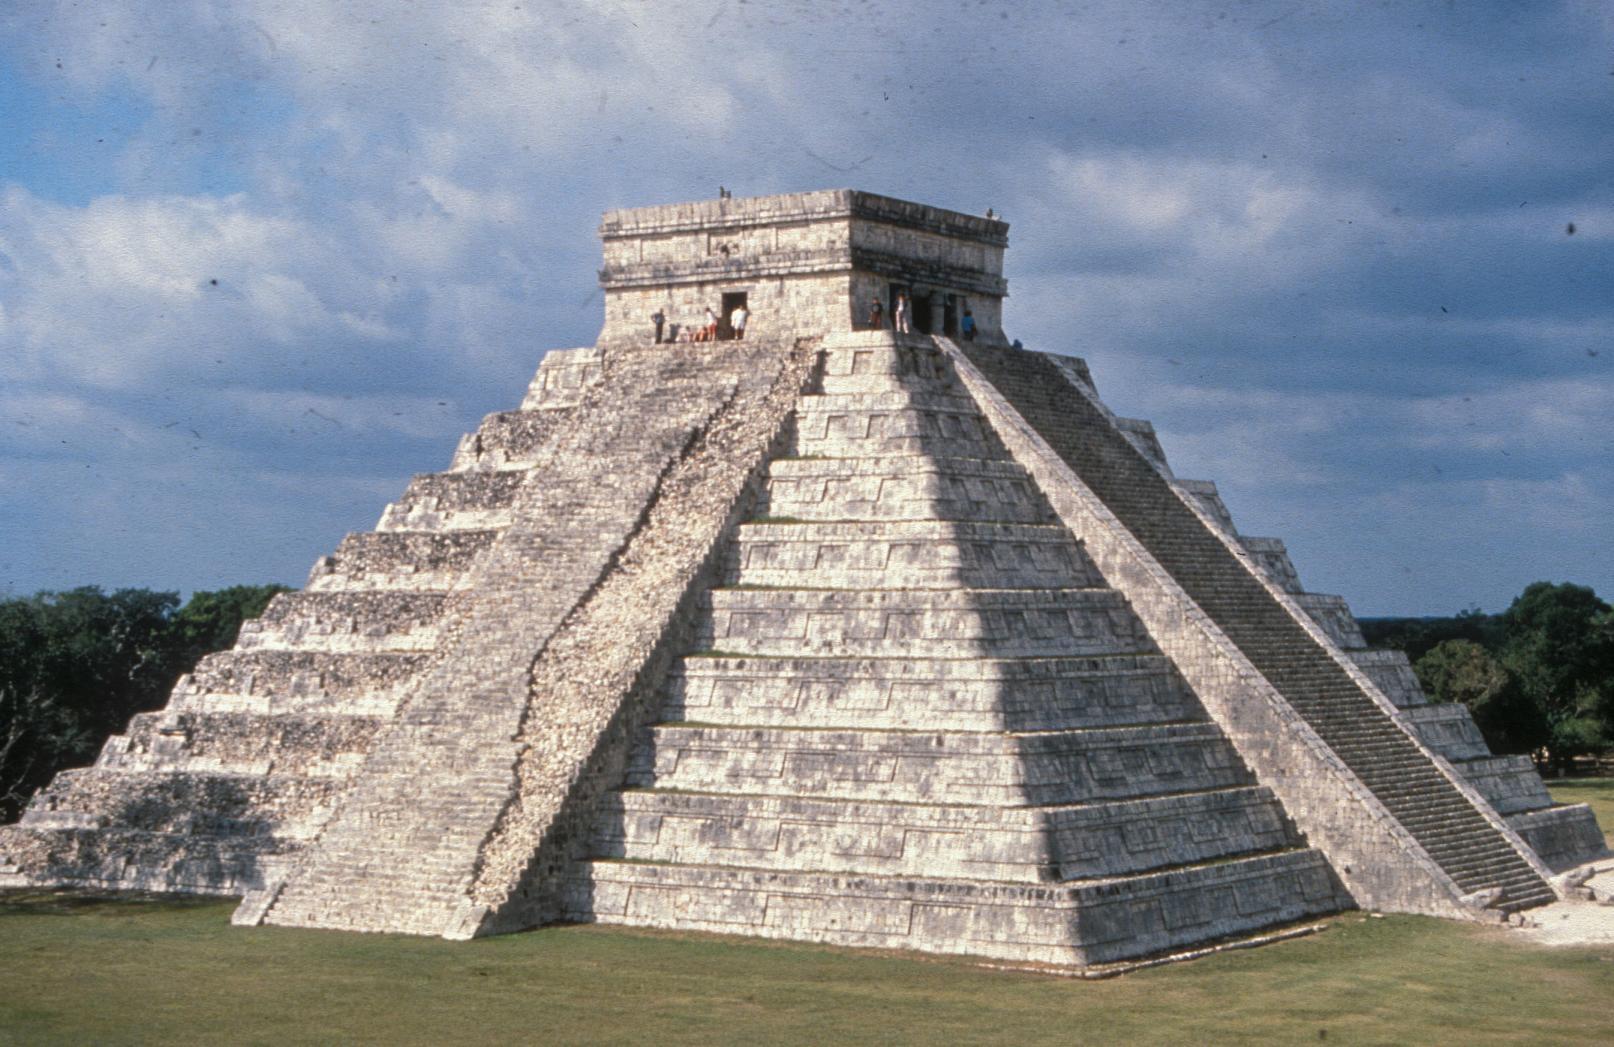 Aztec clipart great pyramid #12